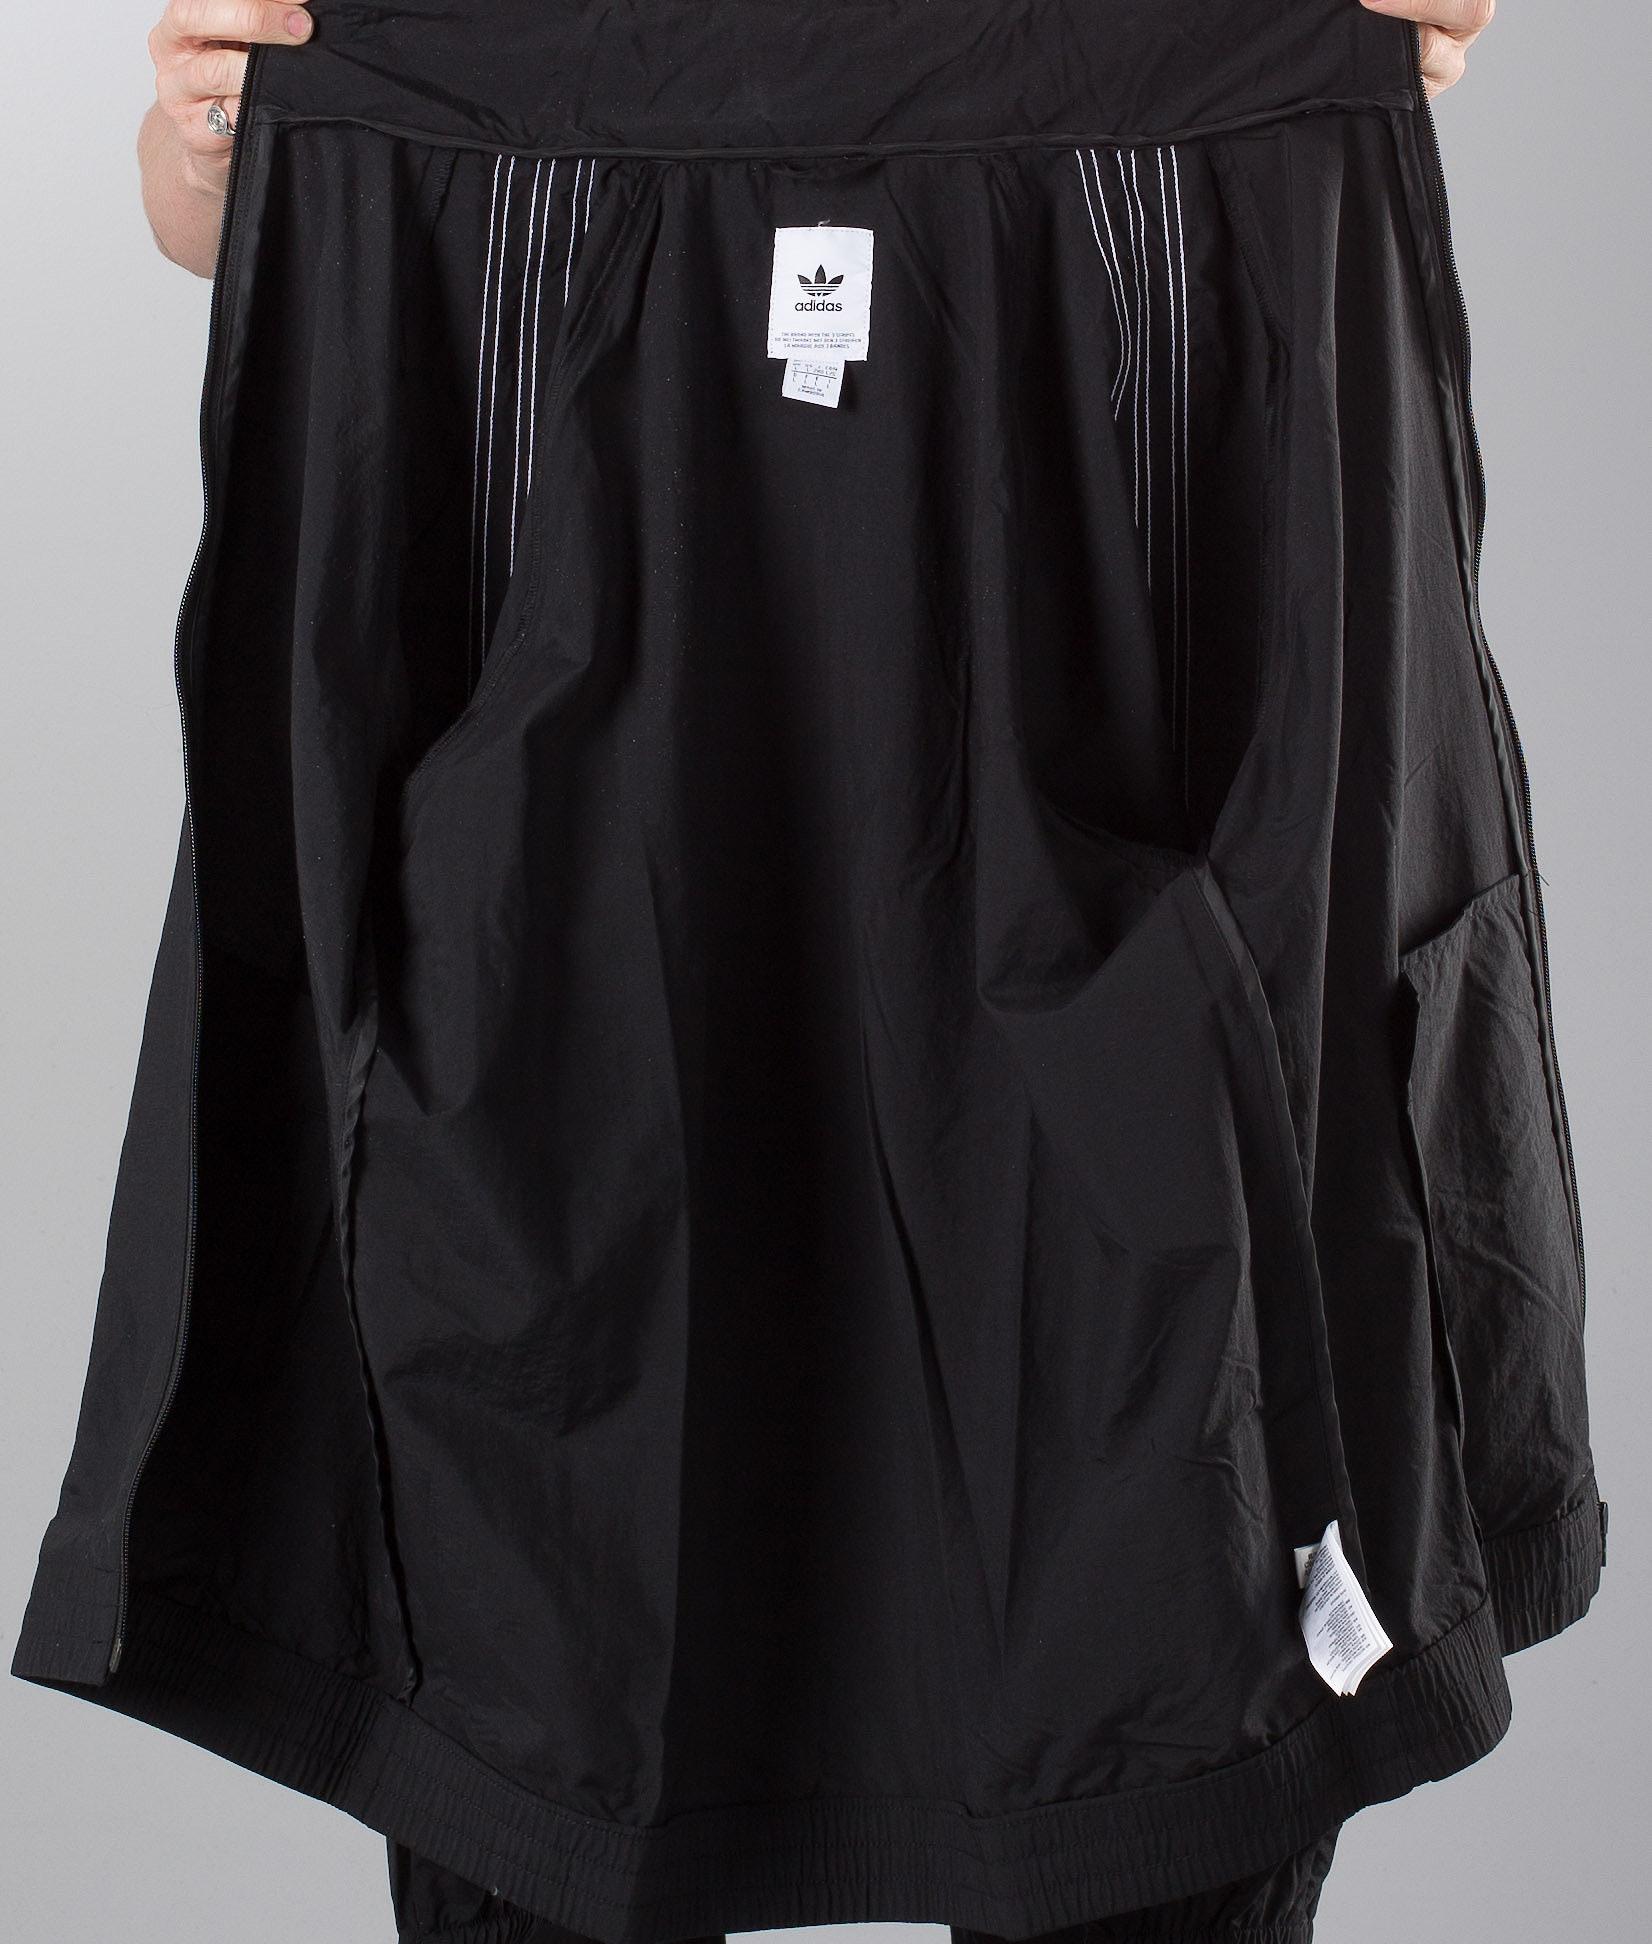 4929e199 Adidas Originals SST Jakke Black - Ridestore.no